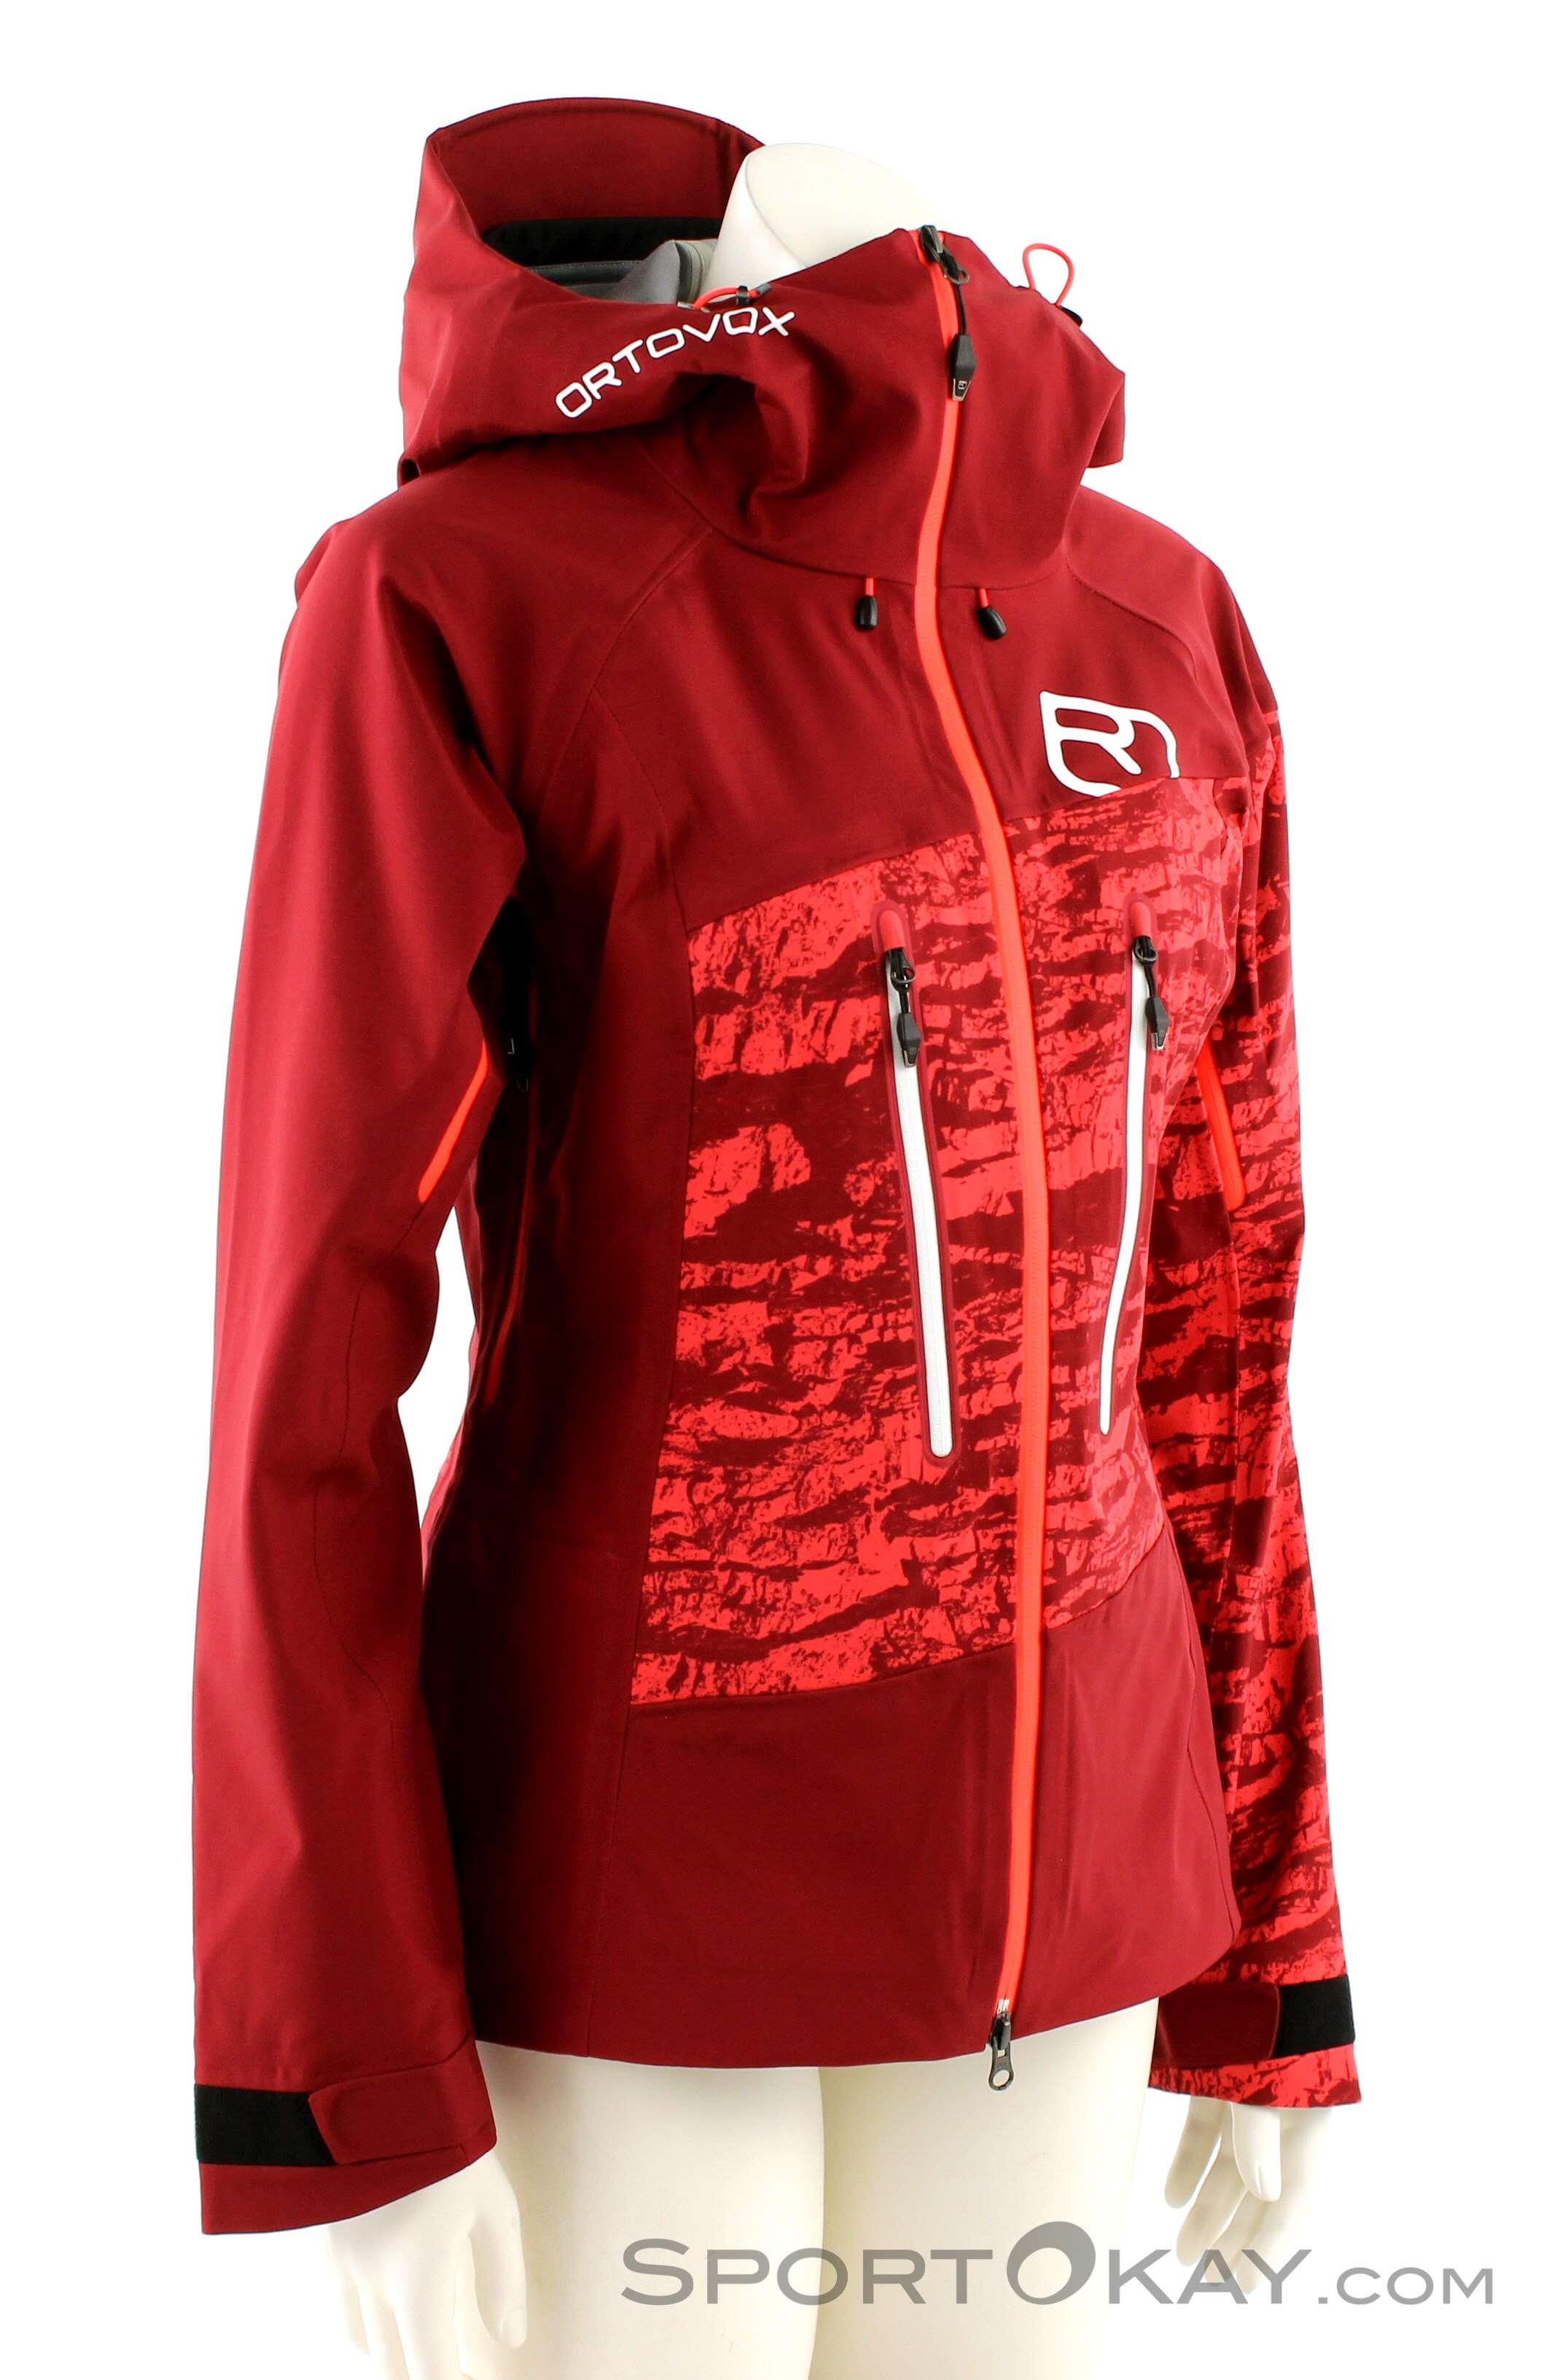 Ortovox Ortovox 3L Guardian Shell Jacket Damen Tourenjacke